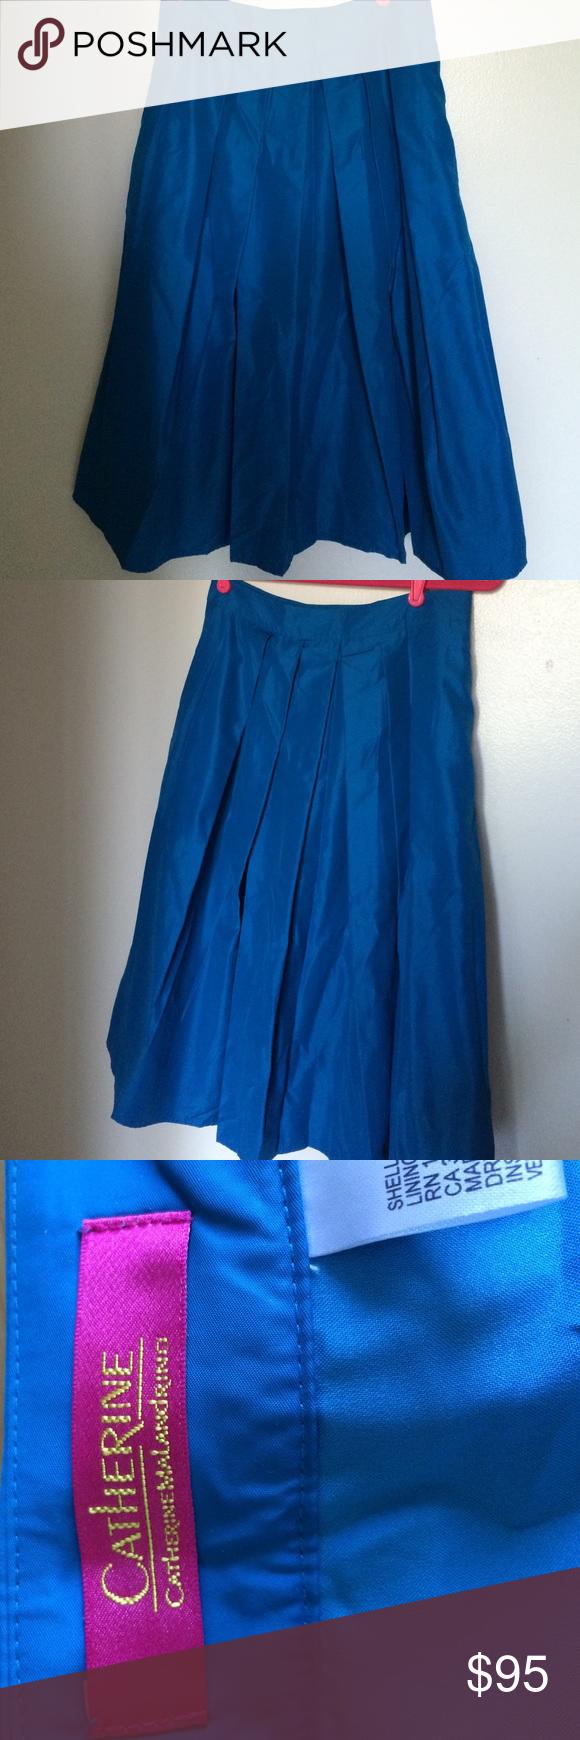 Catherine Malandrino blue midi skirt. Size 6. New with tags taffeta-like blue skirt. Catherine Malandrino. Size 6. Catherine Malandrino Skirts Midi